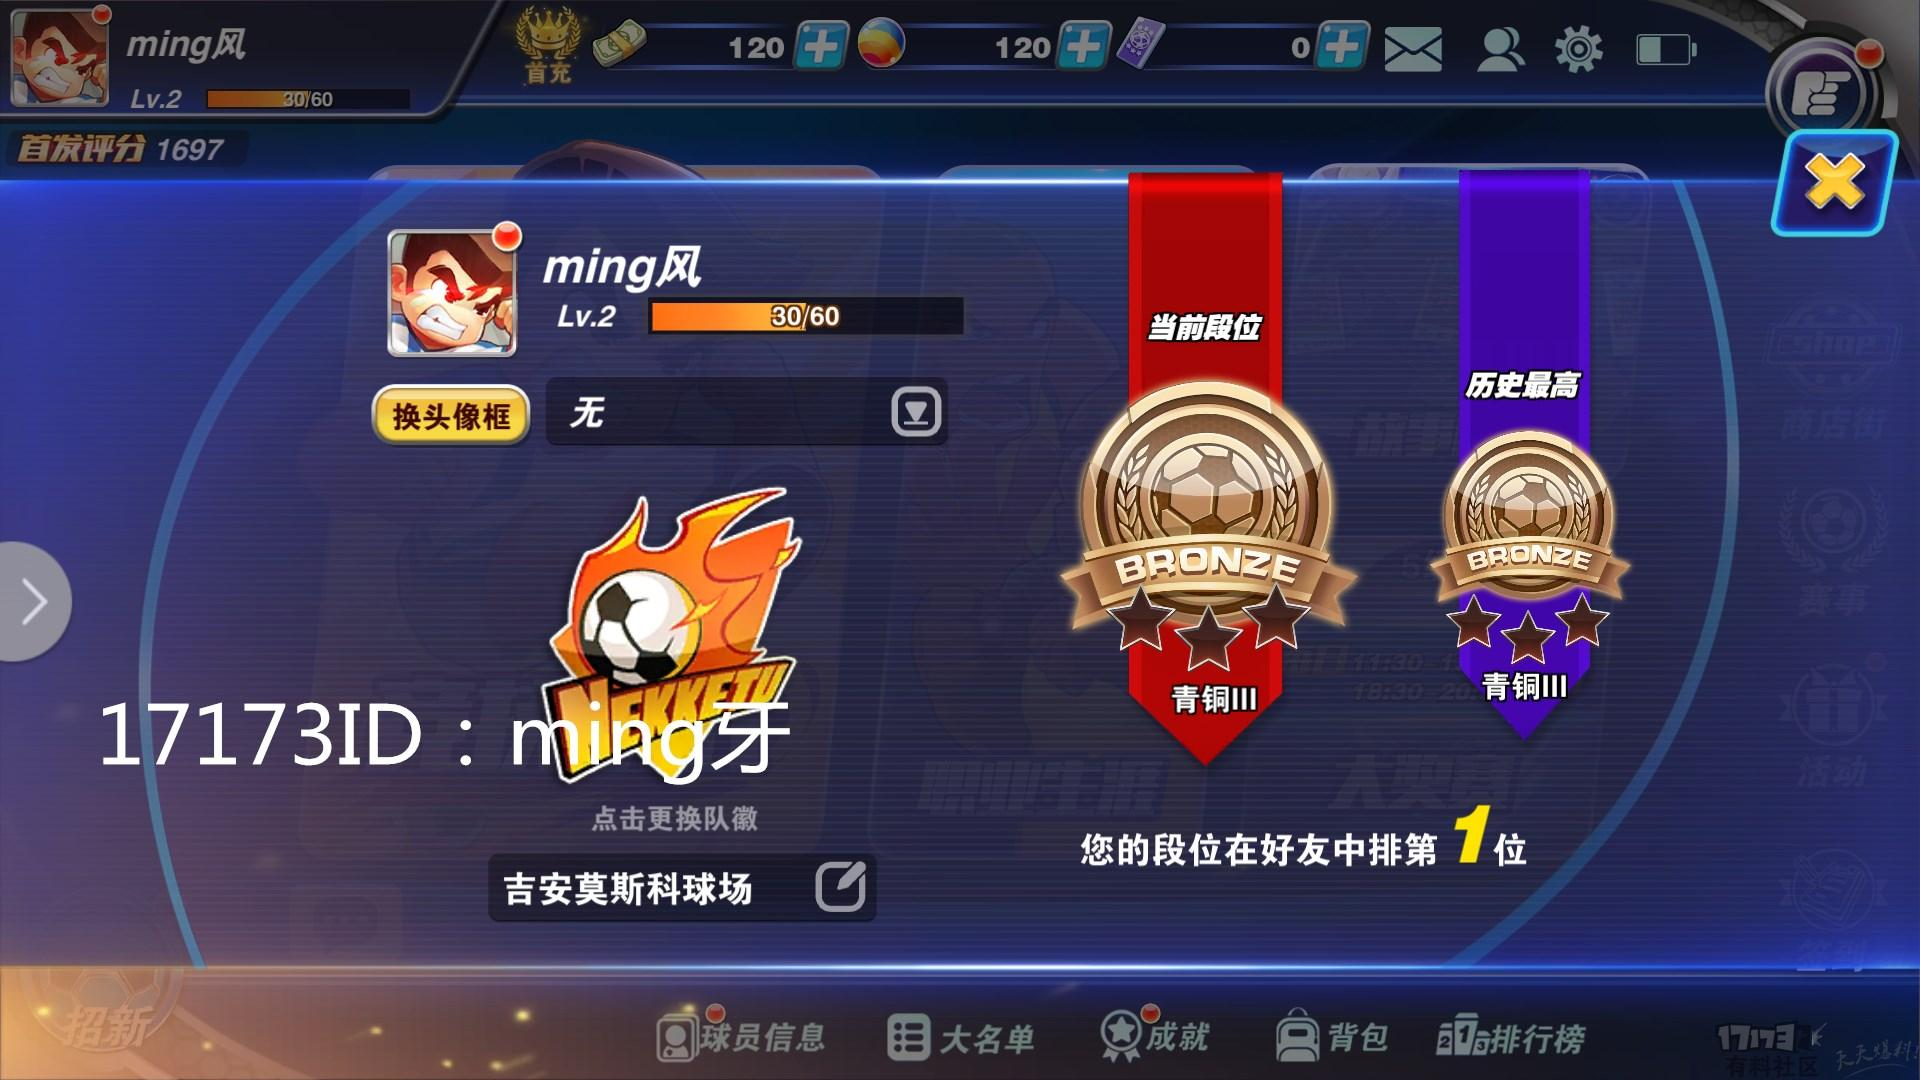 Screenshot_2018-06-04-15-30-36-688_com.ourpalm.rx_副本.jpg